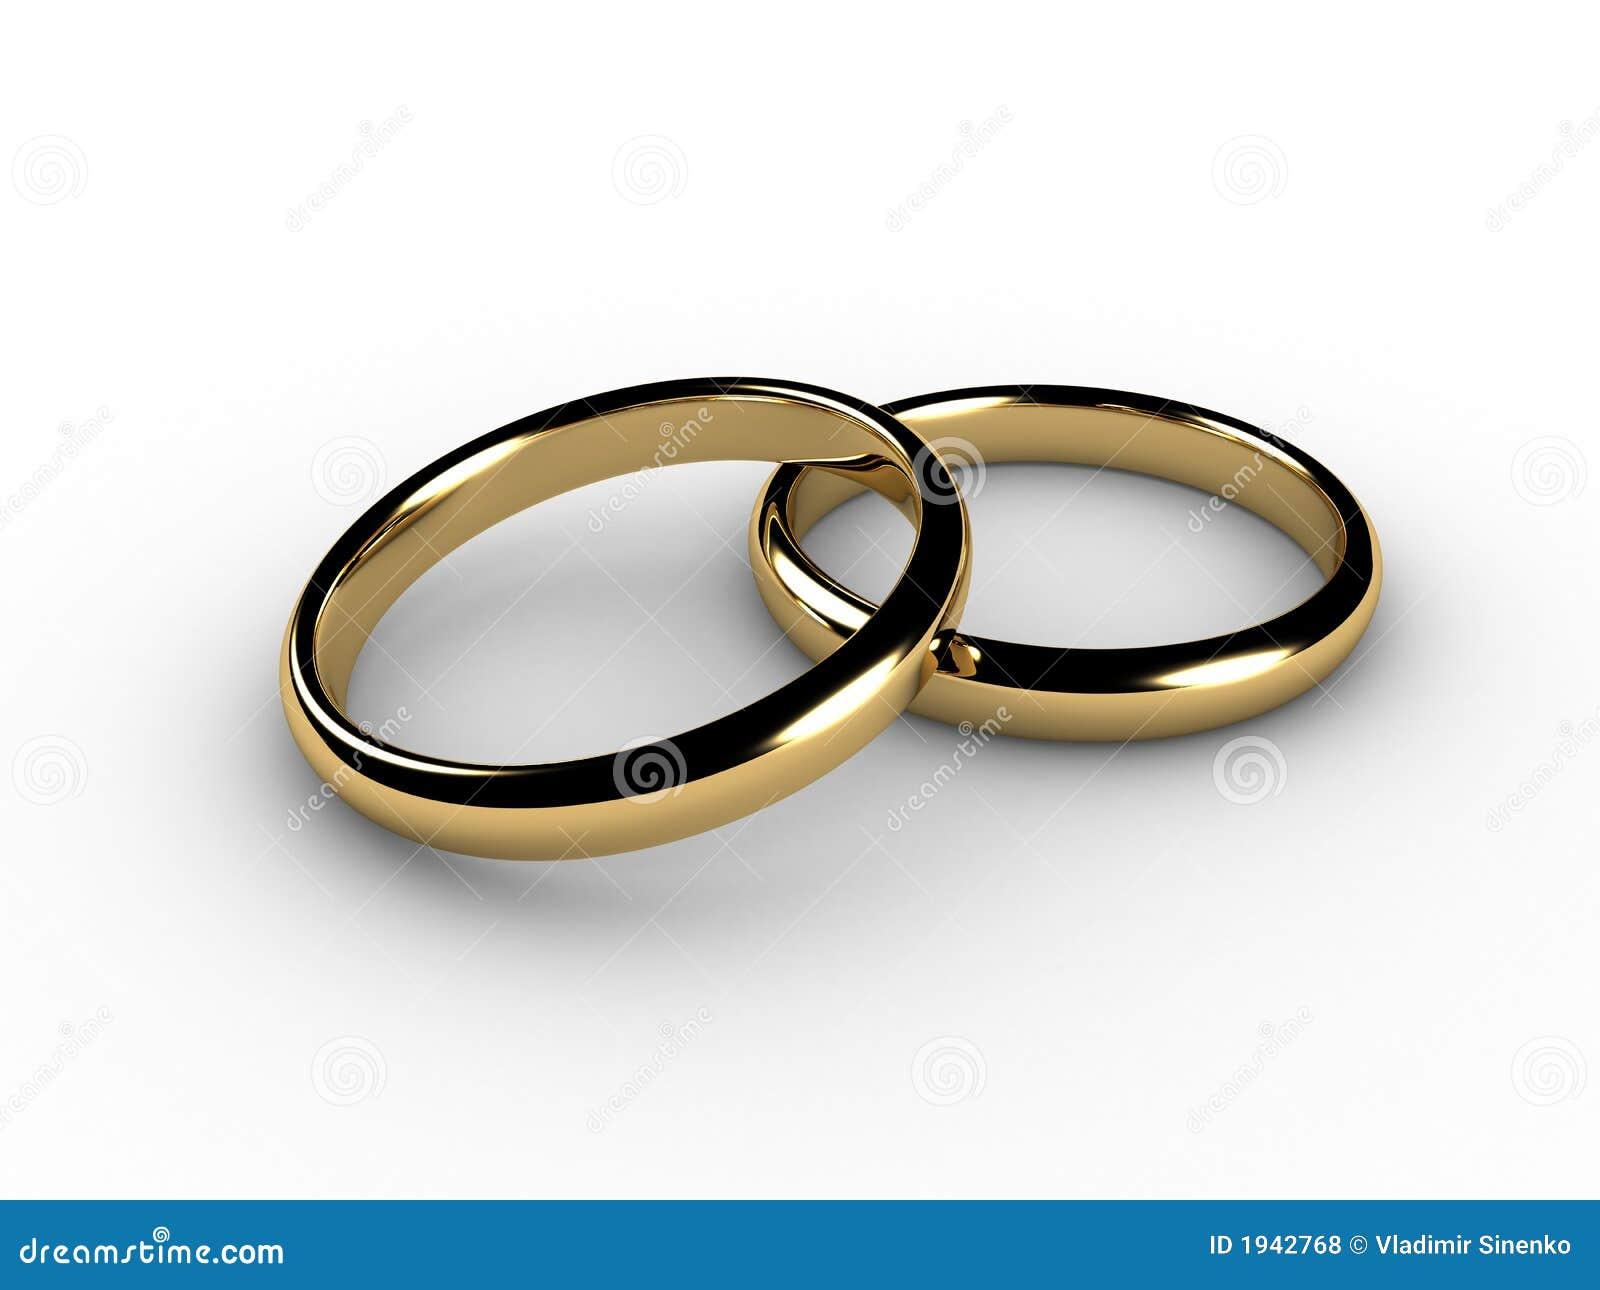 imagen de anillos: